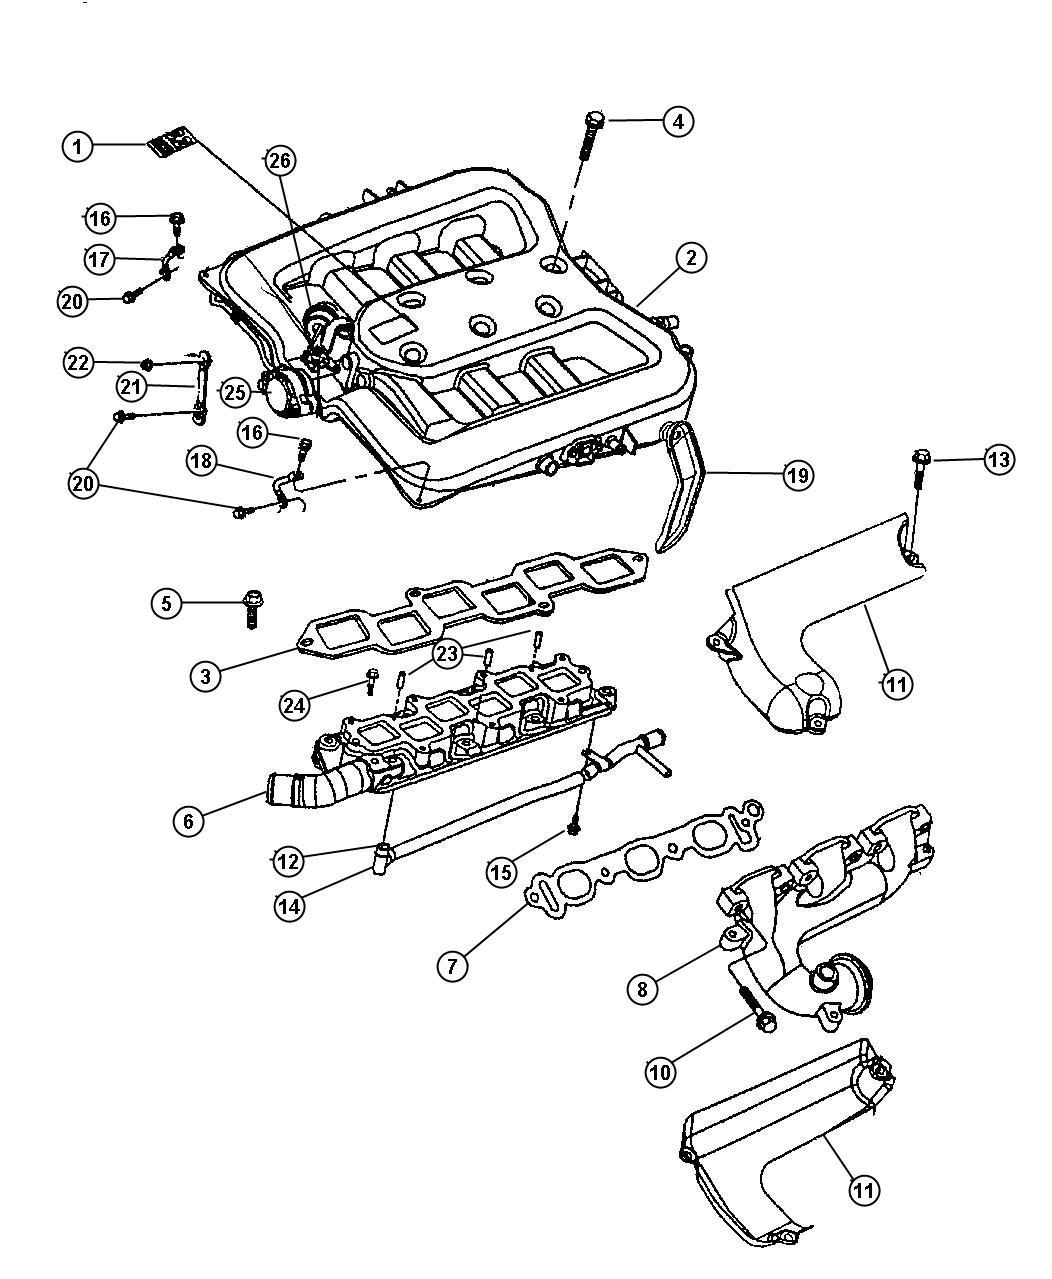 Chrysler 300 27 Engine Diagram